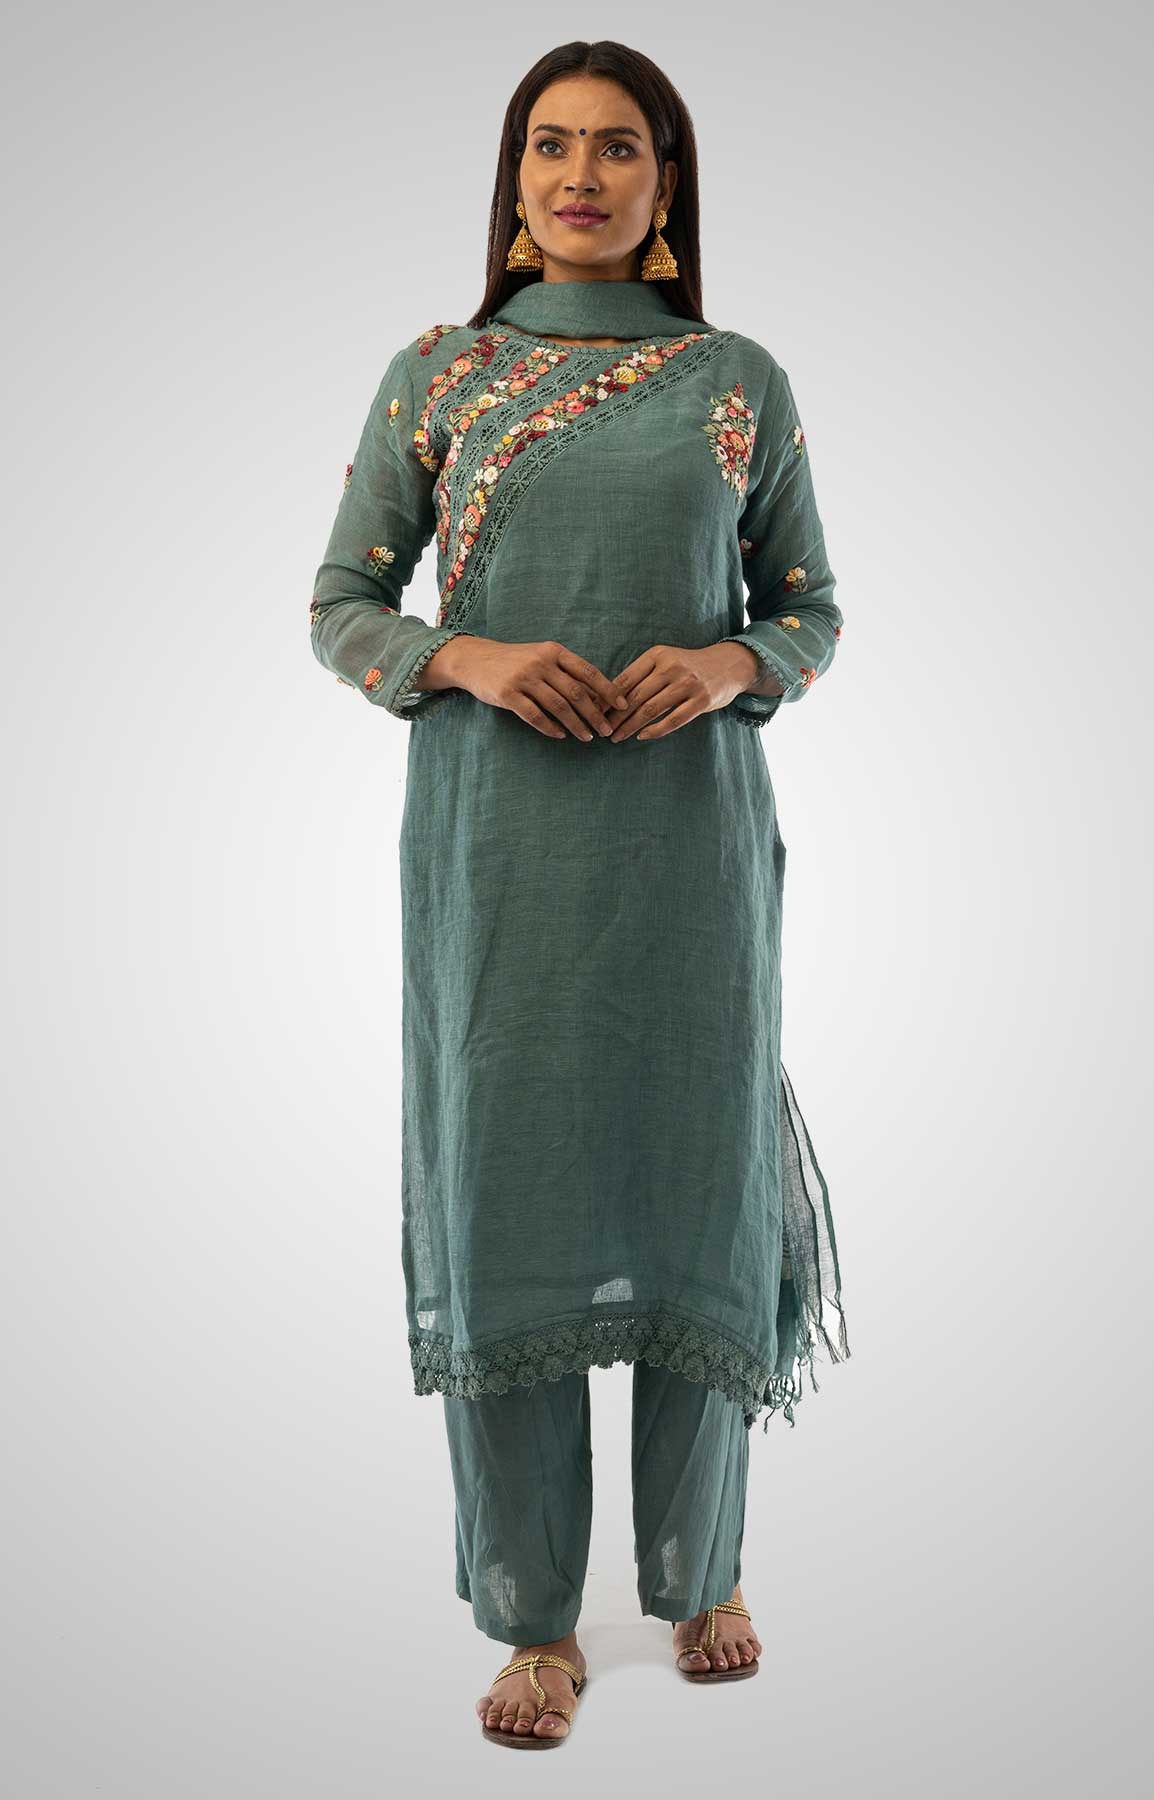 Greyish Blue Linen Suit With Handloom Linen Duppatta Adorned With Resham Work – Viraaya By Ushnakmals